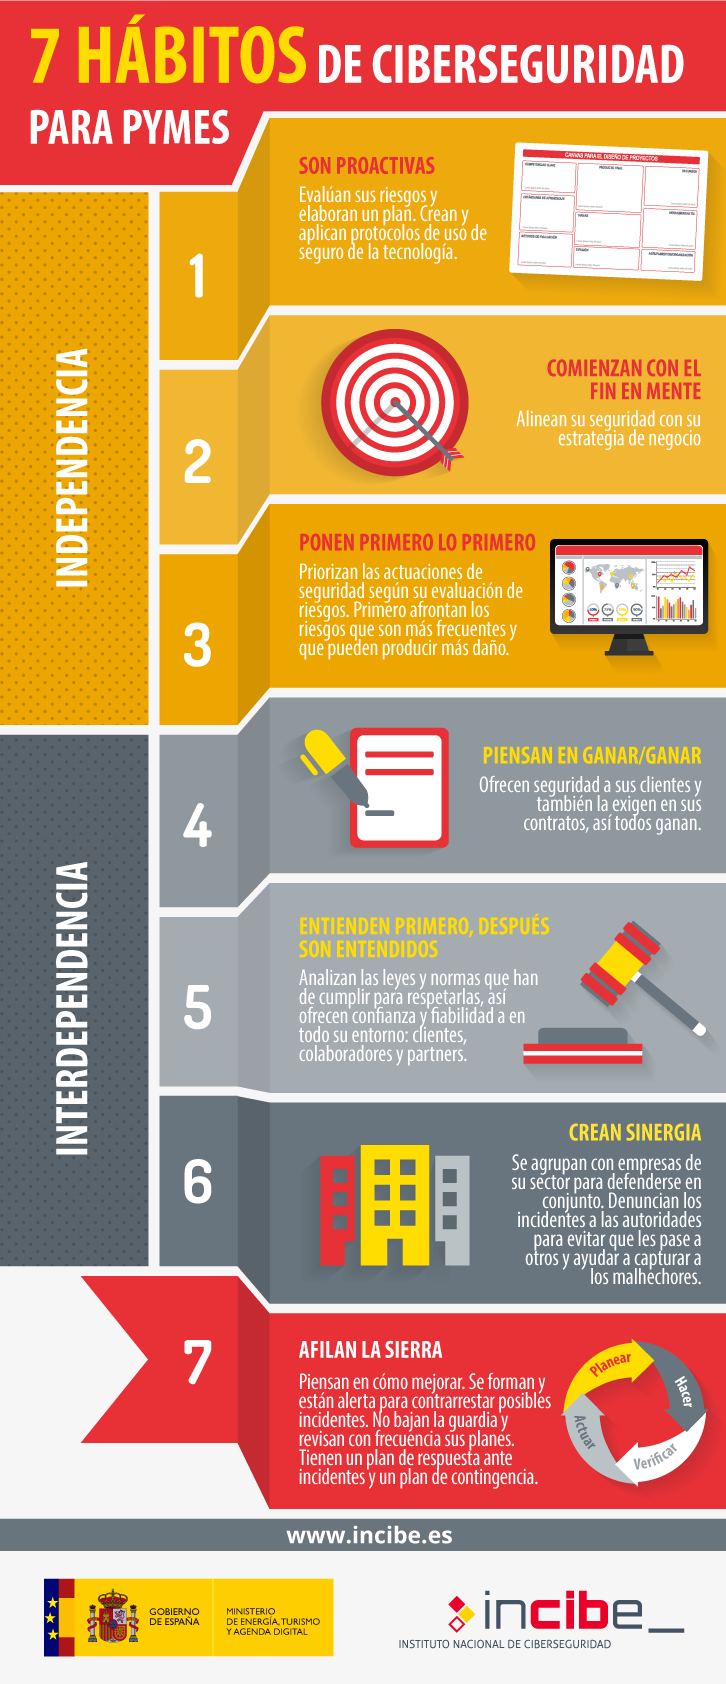 7 hábitos de ciberseguridad para pymes